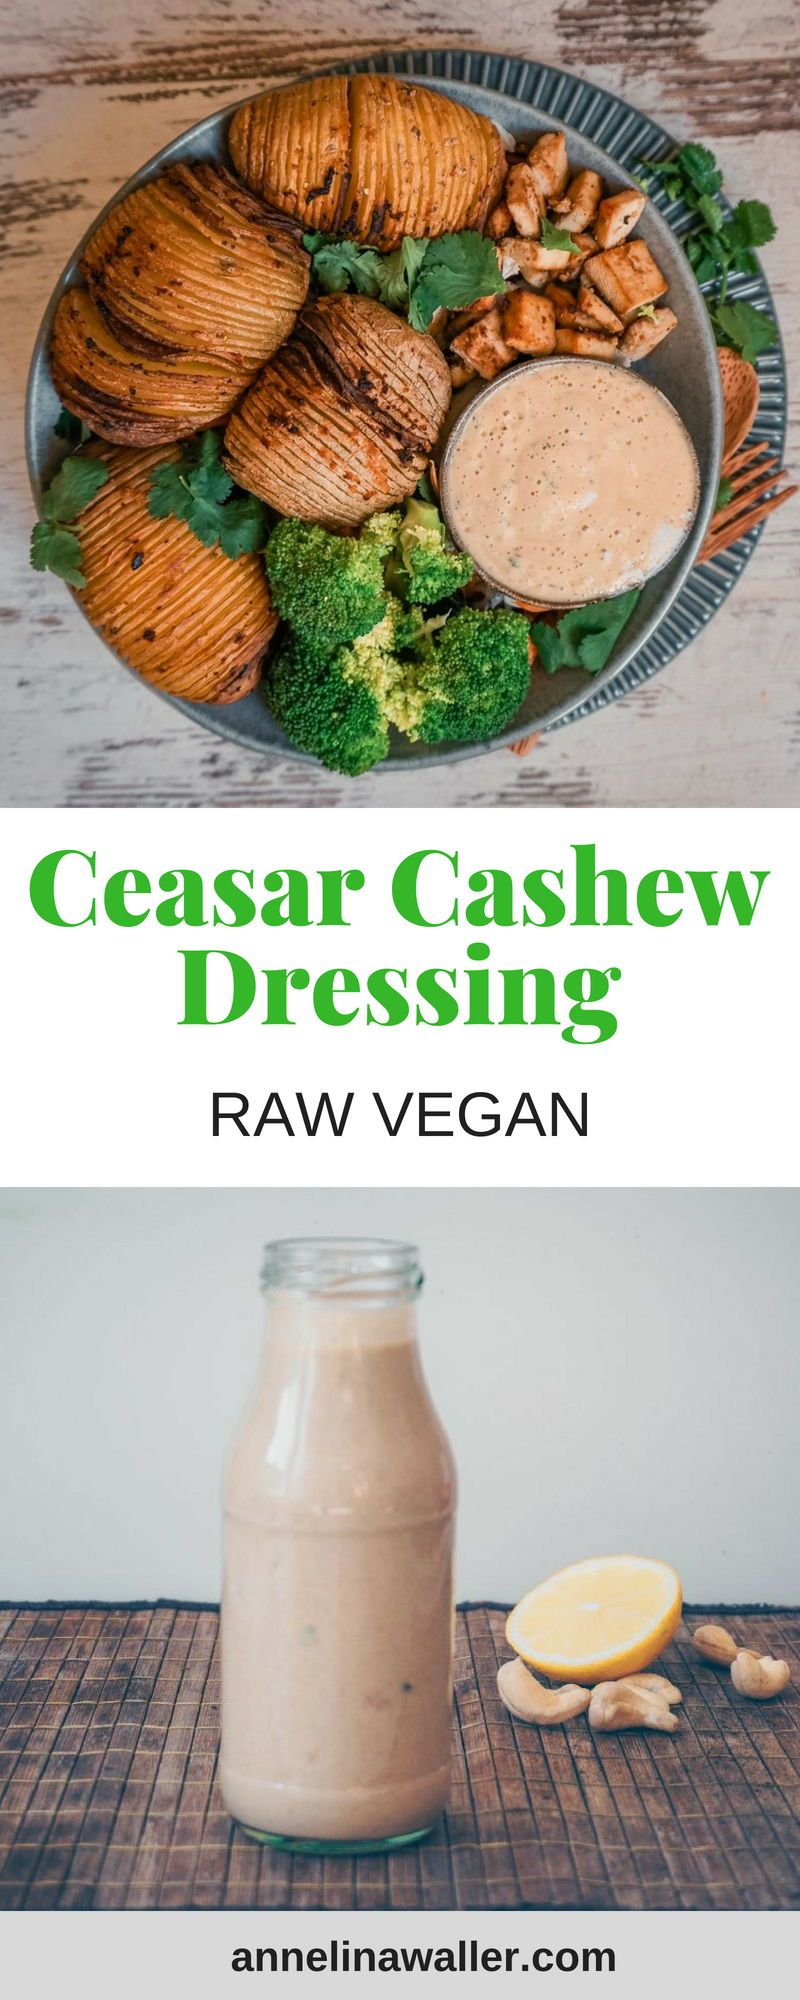 Creamy Cesar Cashew Dressing Raw Vegan Rezept Vegane Rezepte Vegane Rezepte Abnehmen Und Vegane Rezepte Einfach